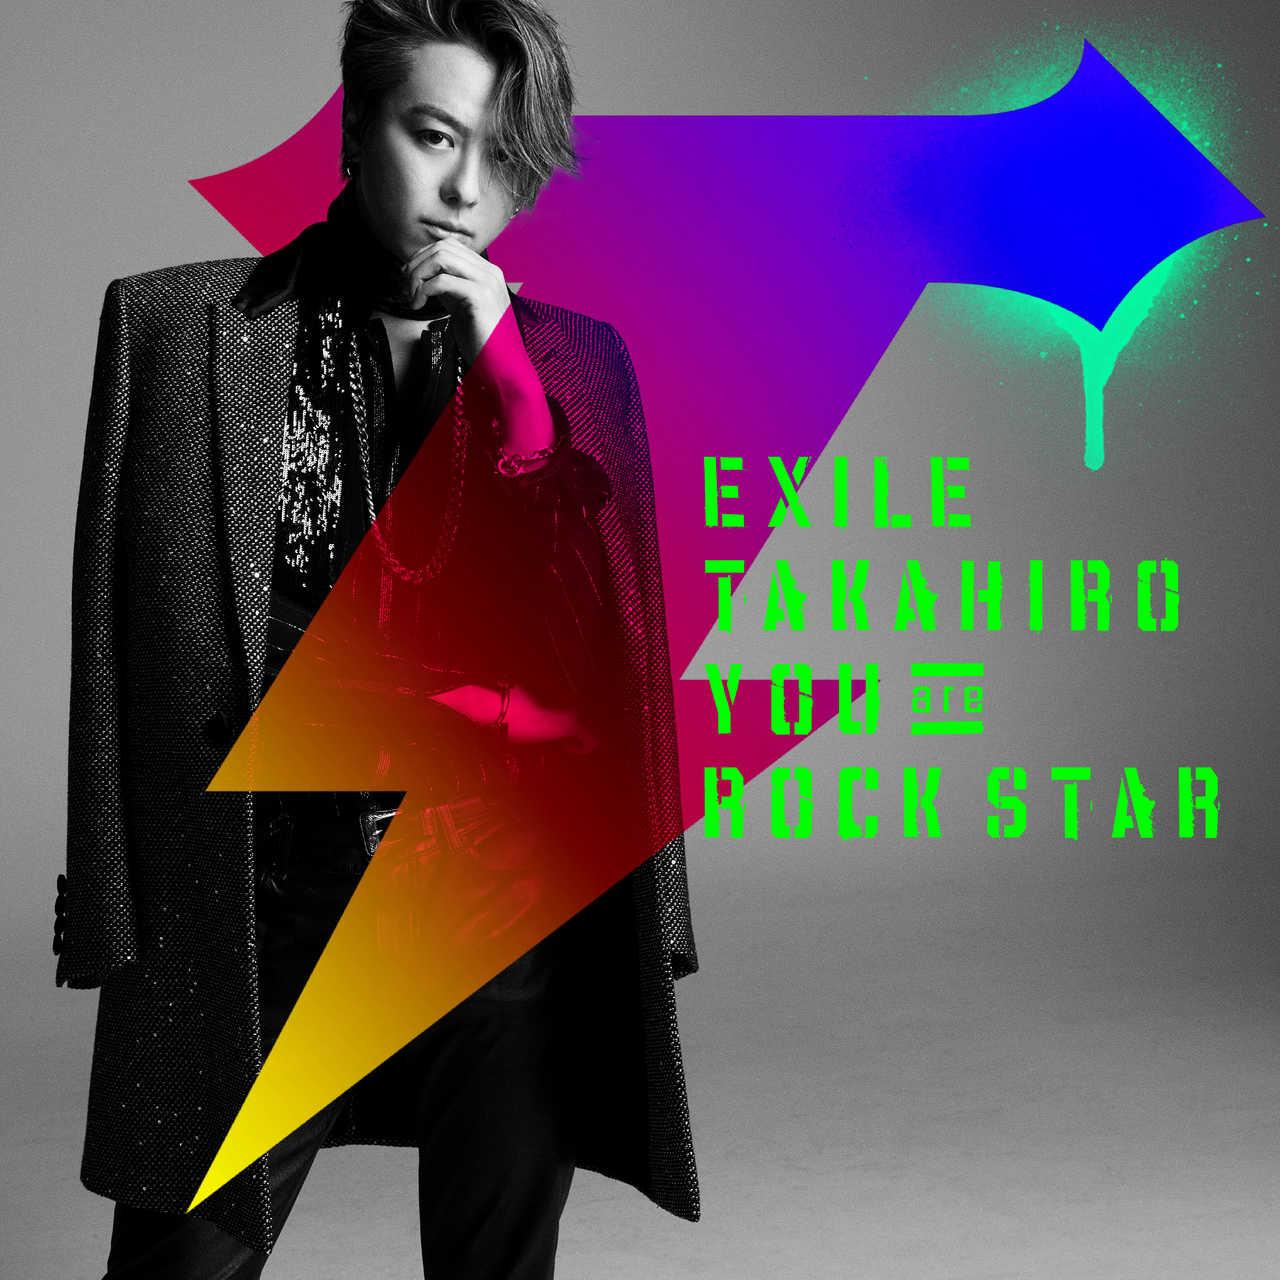 EXILE TAKAHIRO 新曲「YOU are ROCK STAR」配信スタート!MVも同時解禁!